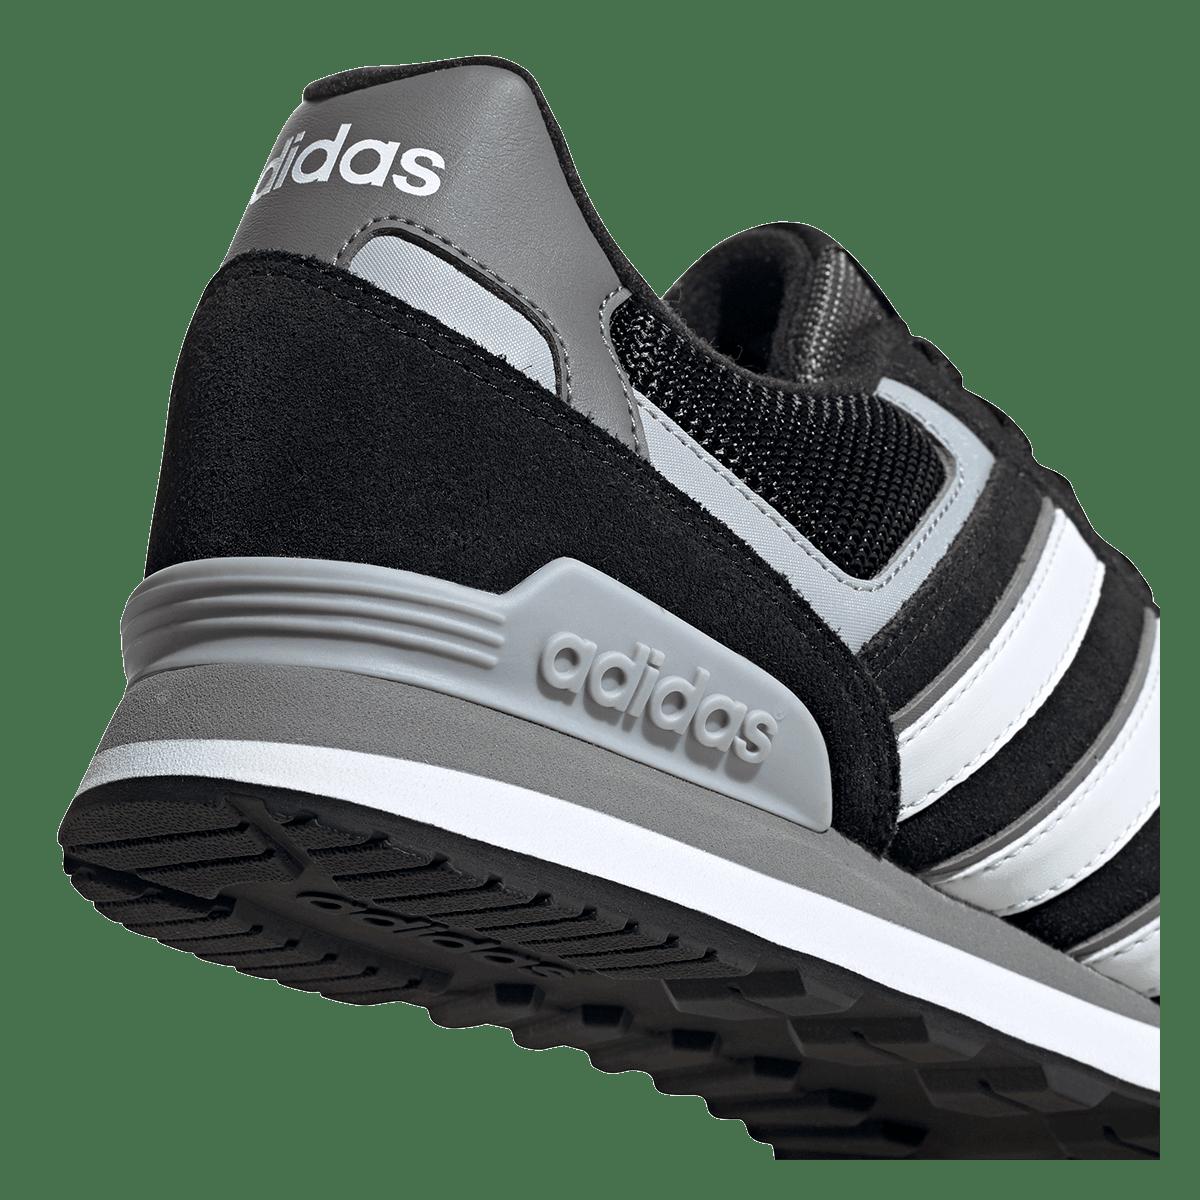 Chaussures de loisirs adidas 10K noir/blanc - Boutique football